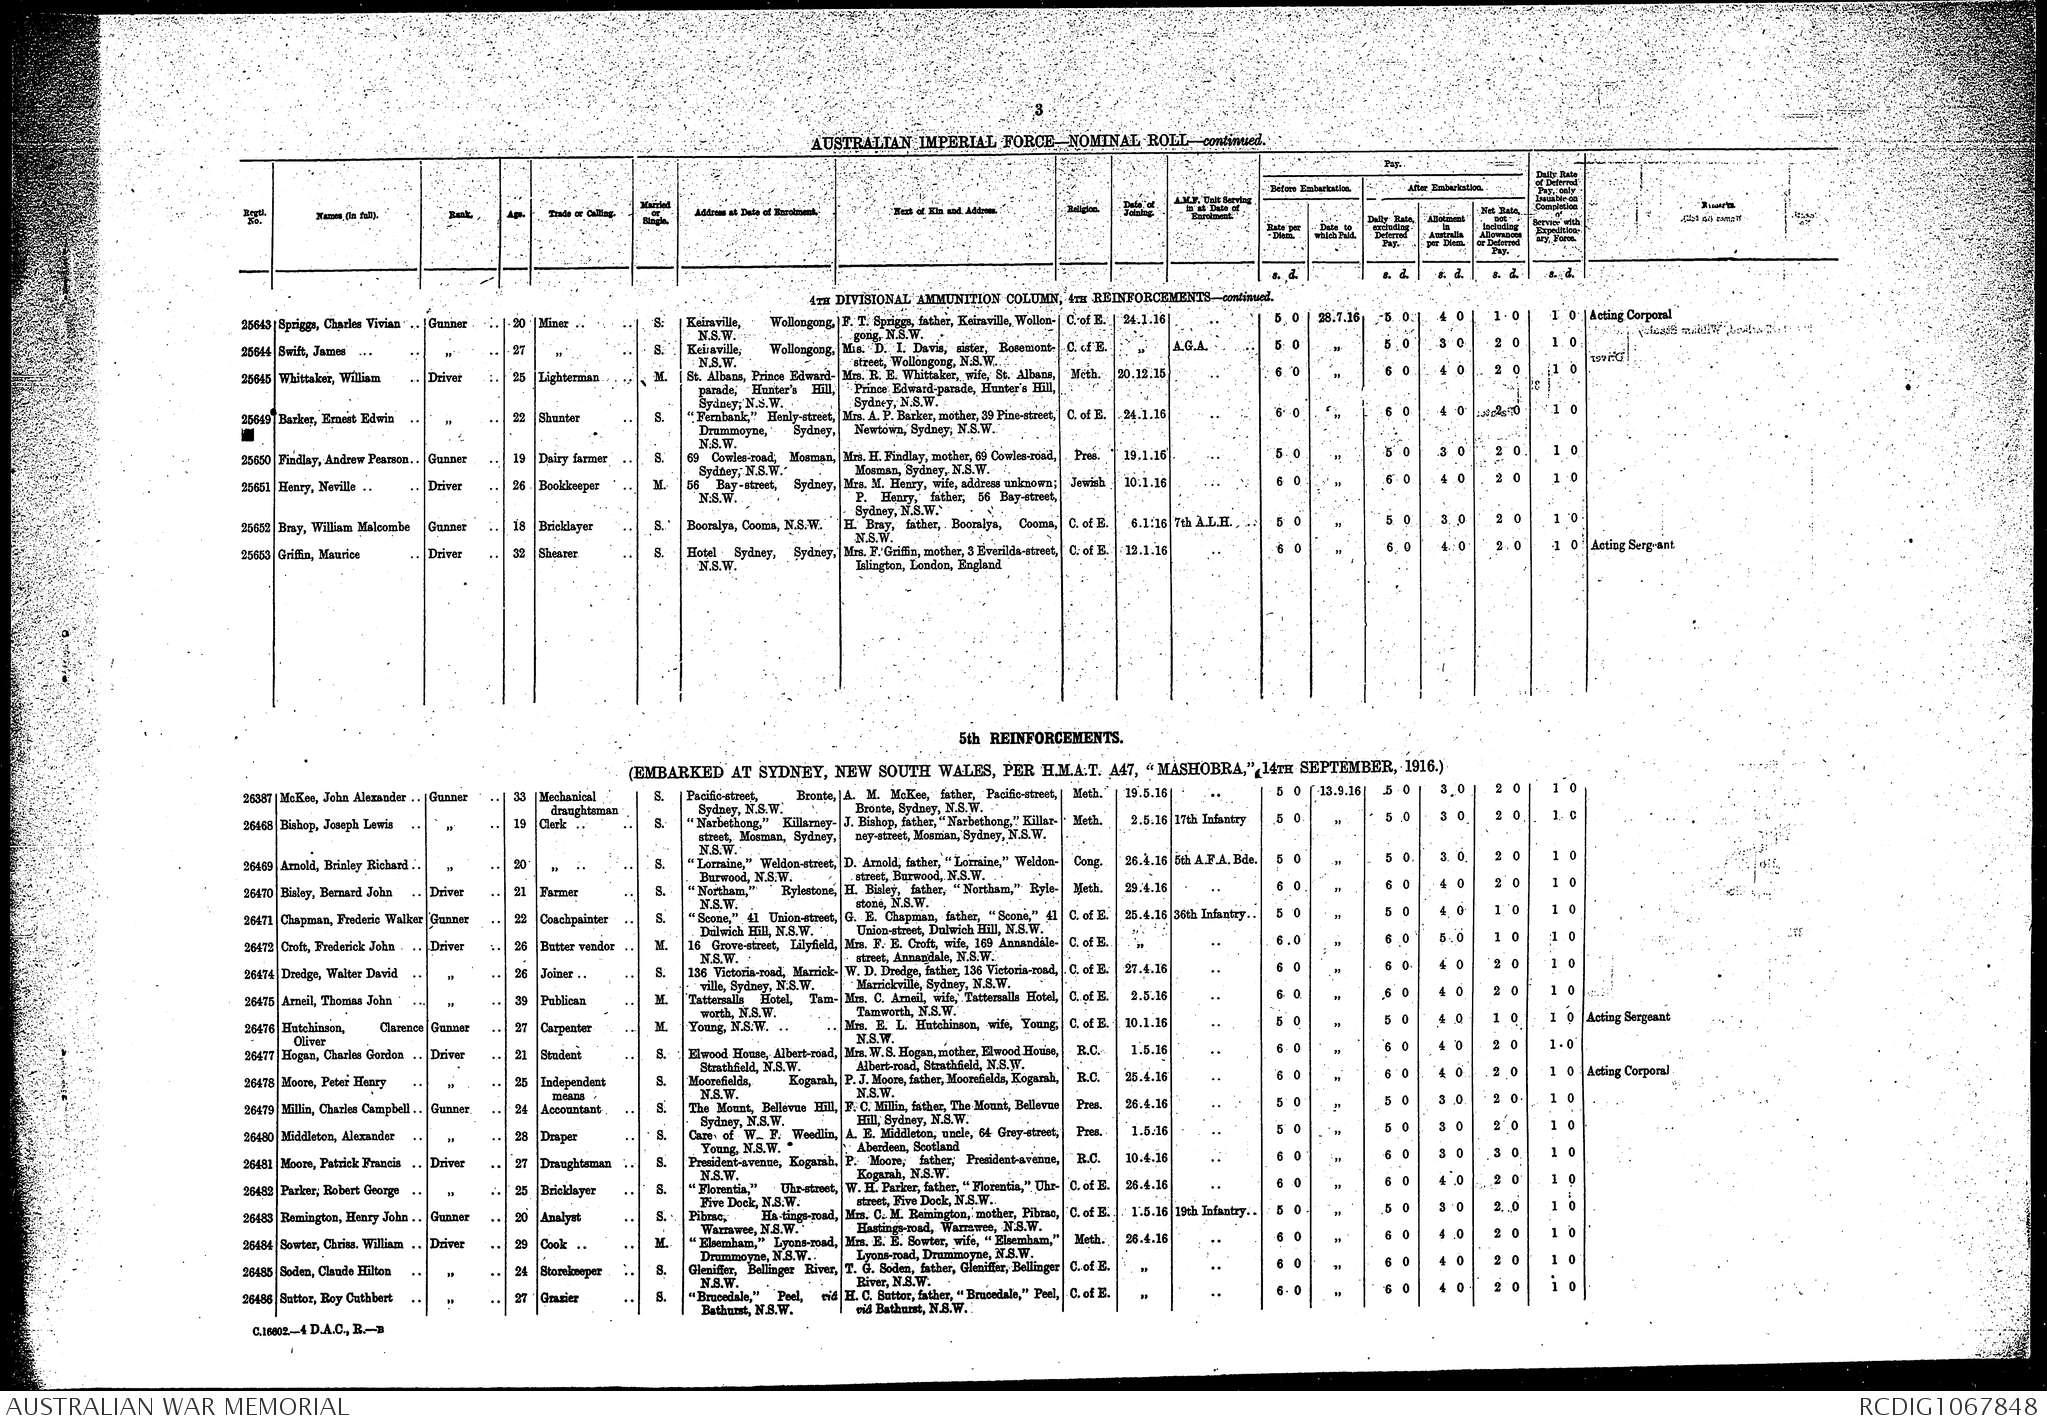 awm8 25  111  3 - 4 divisional ammunition column - 2 to 10 reinforcements  apr 1916